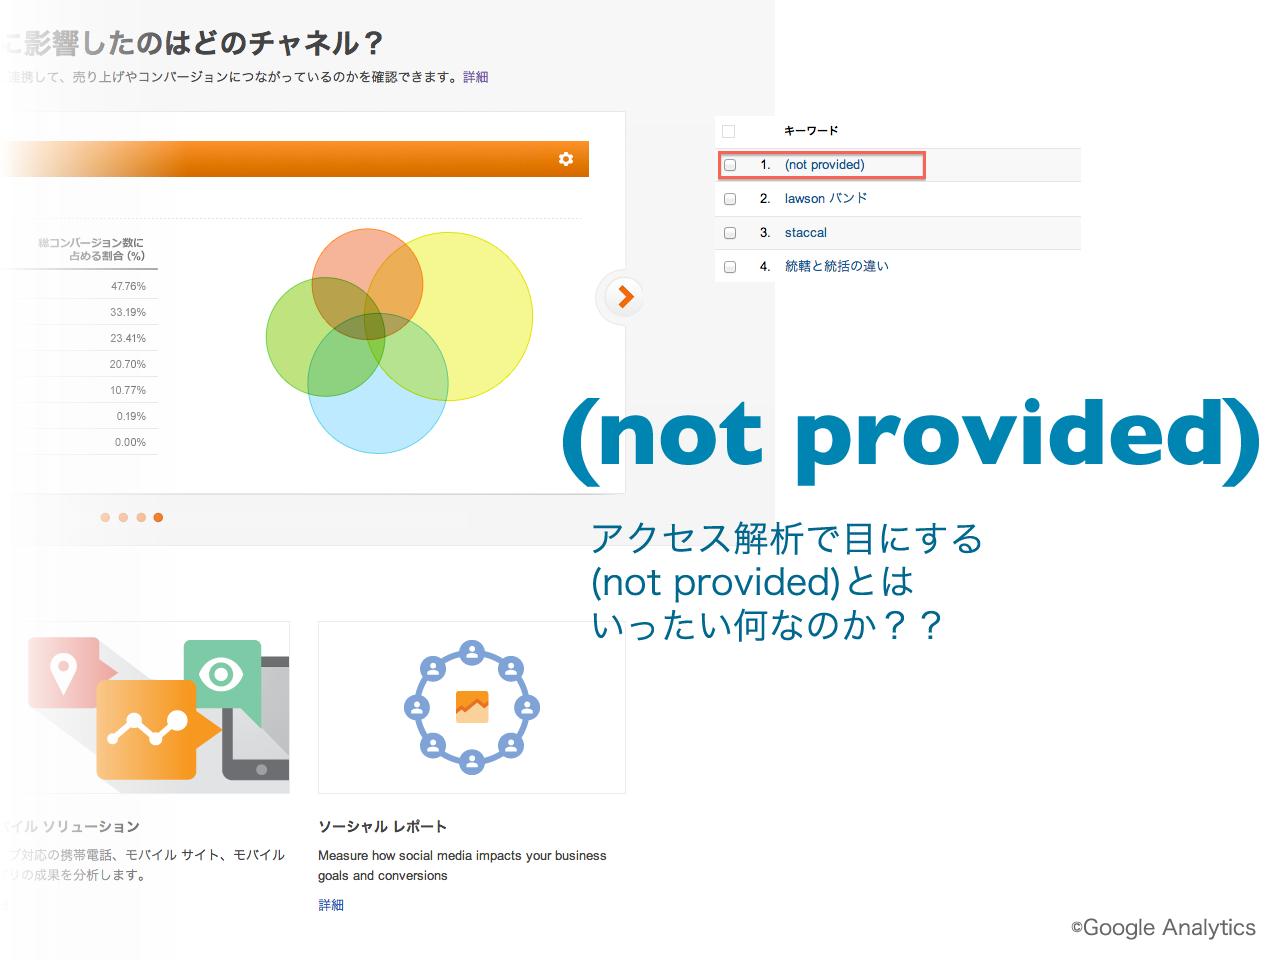 Google Anlyticsの検索キーワード(not provded)とは?